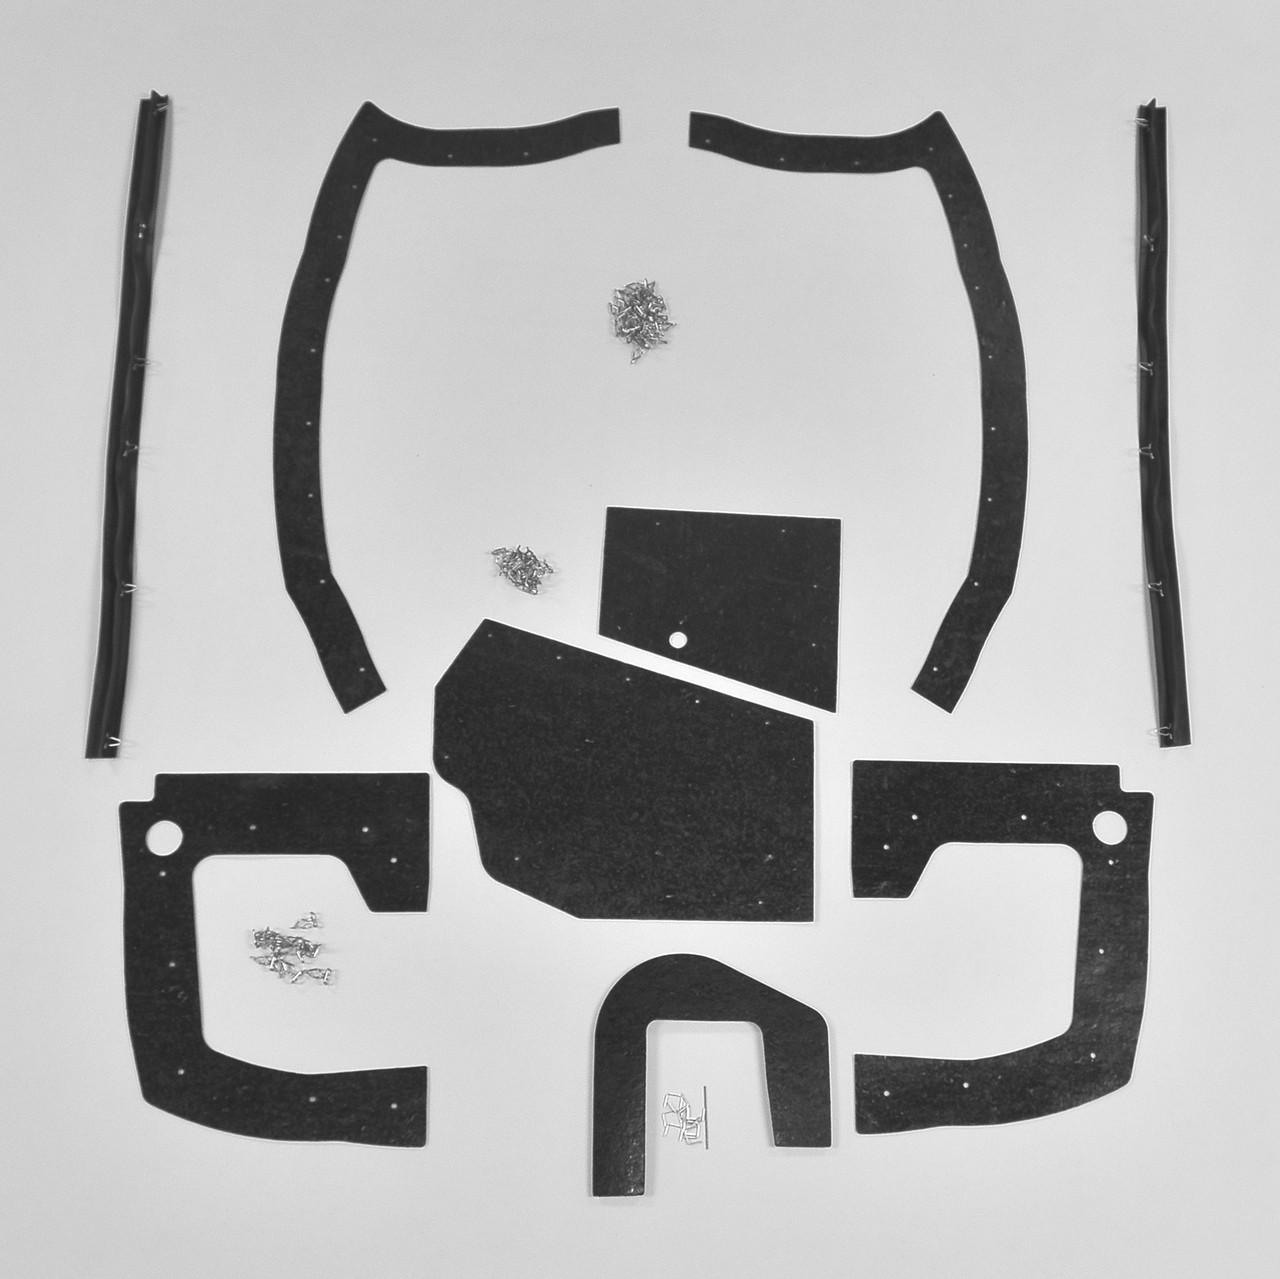 medium resolution of mopar b body 70 coronet super bee mega splash shield set auto detroit muscle technologies llc